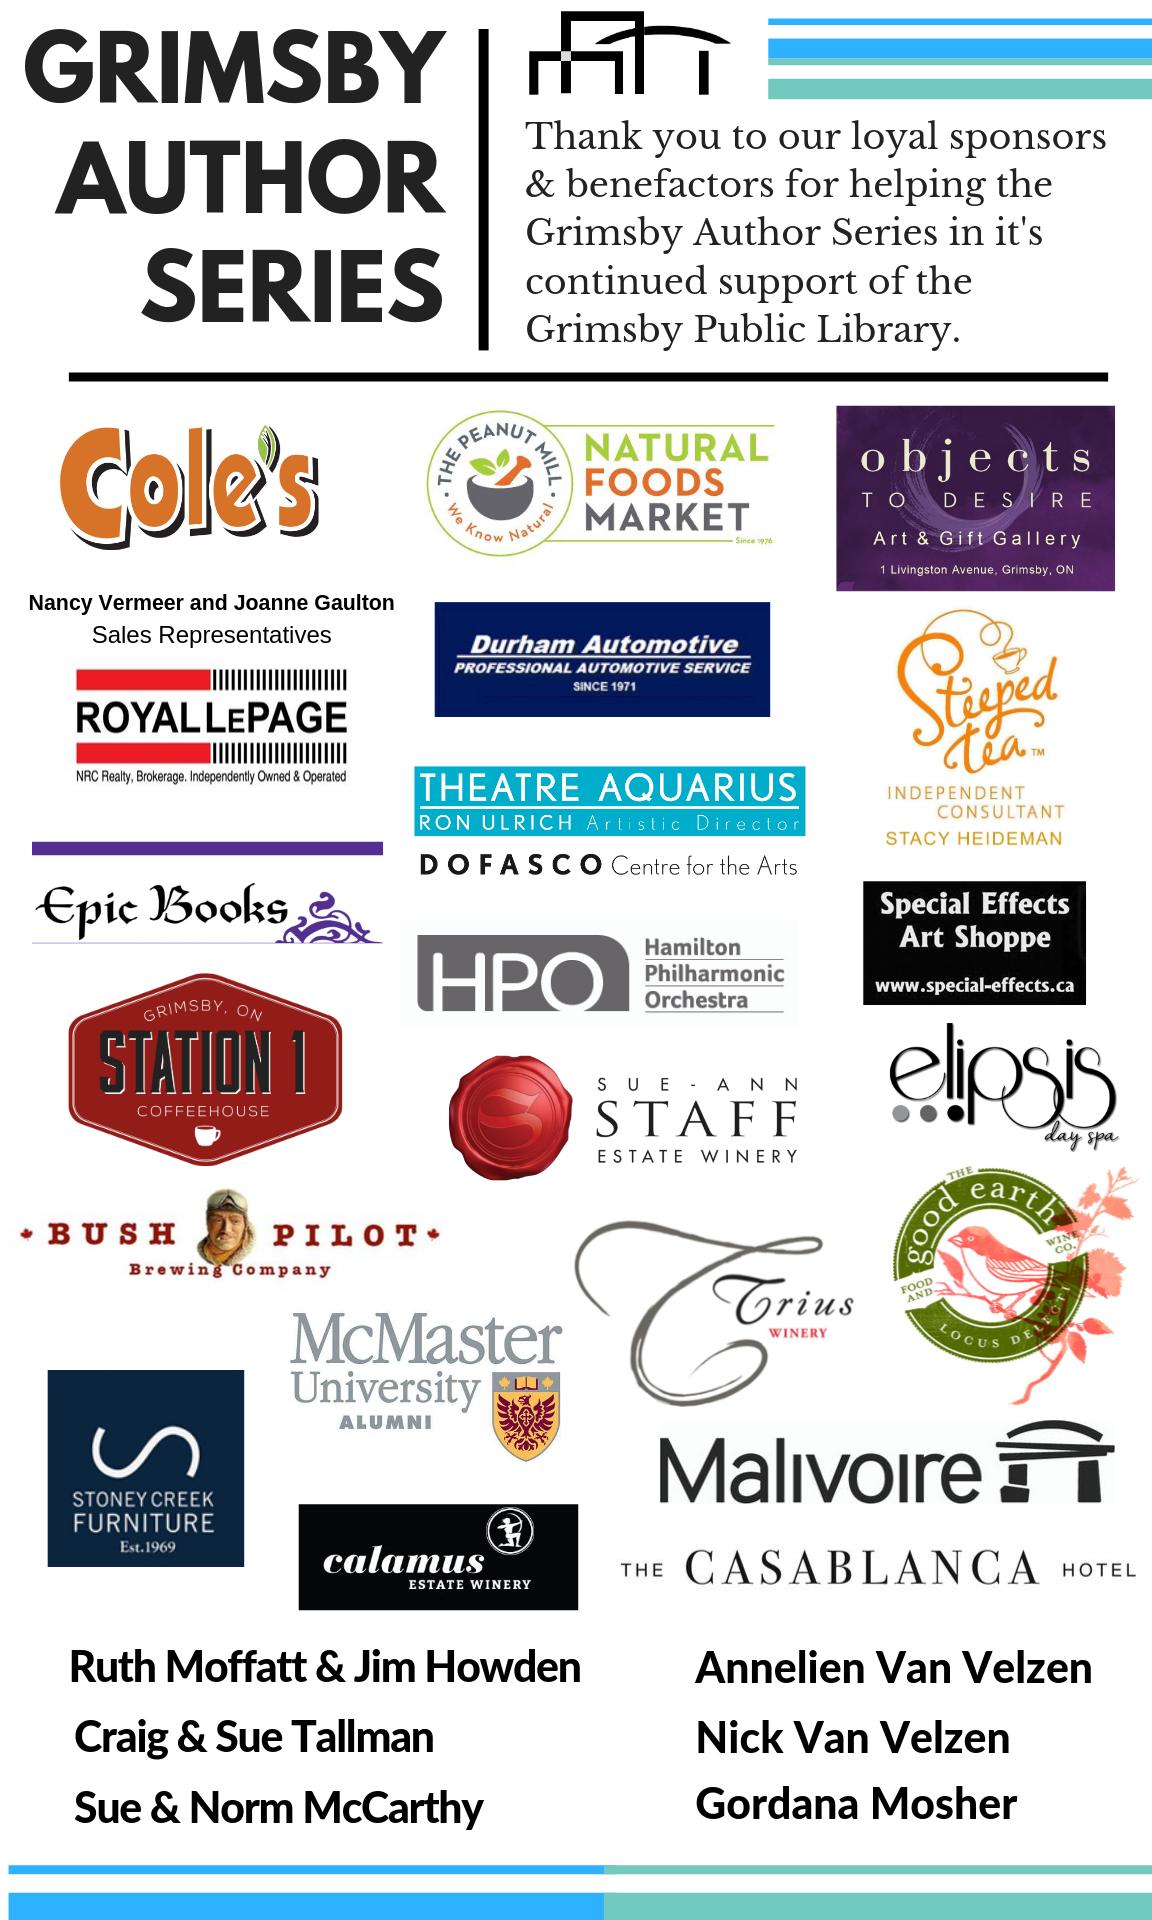 GAS sponsor logos (4)